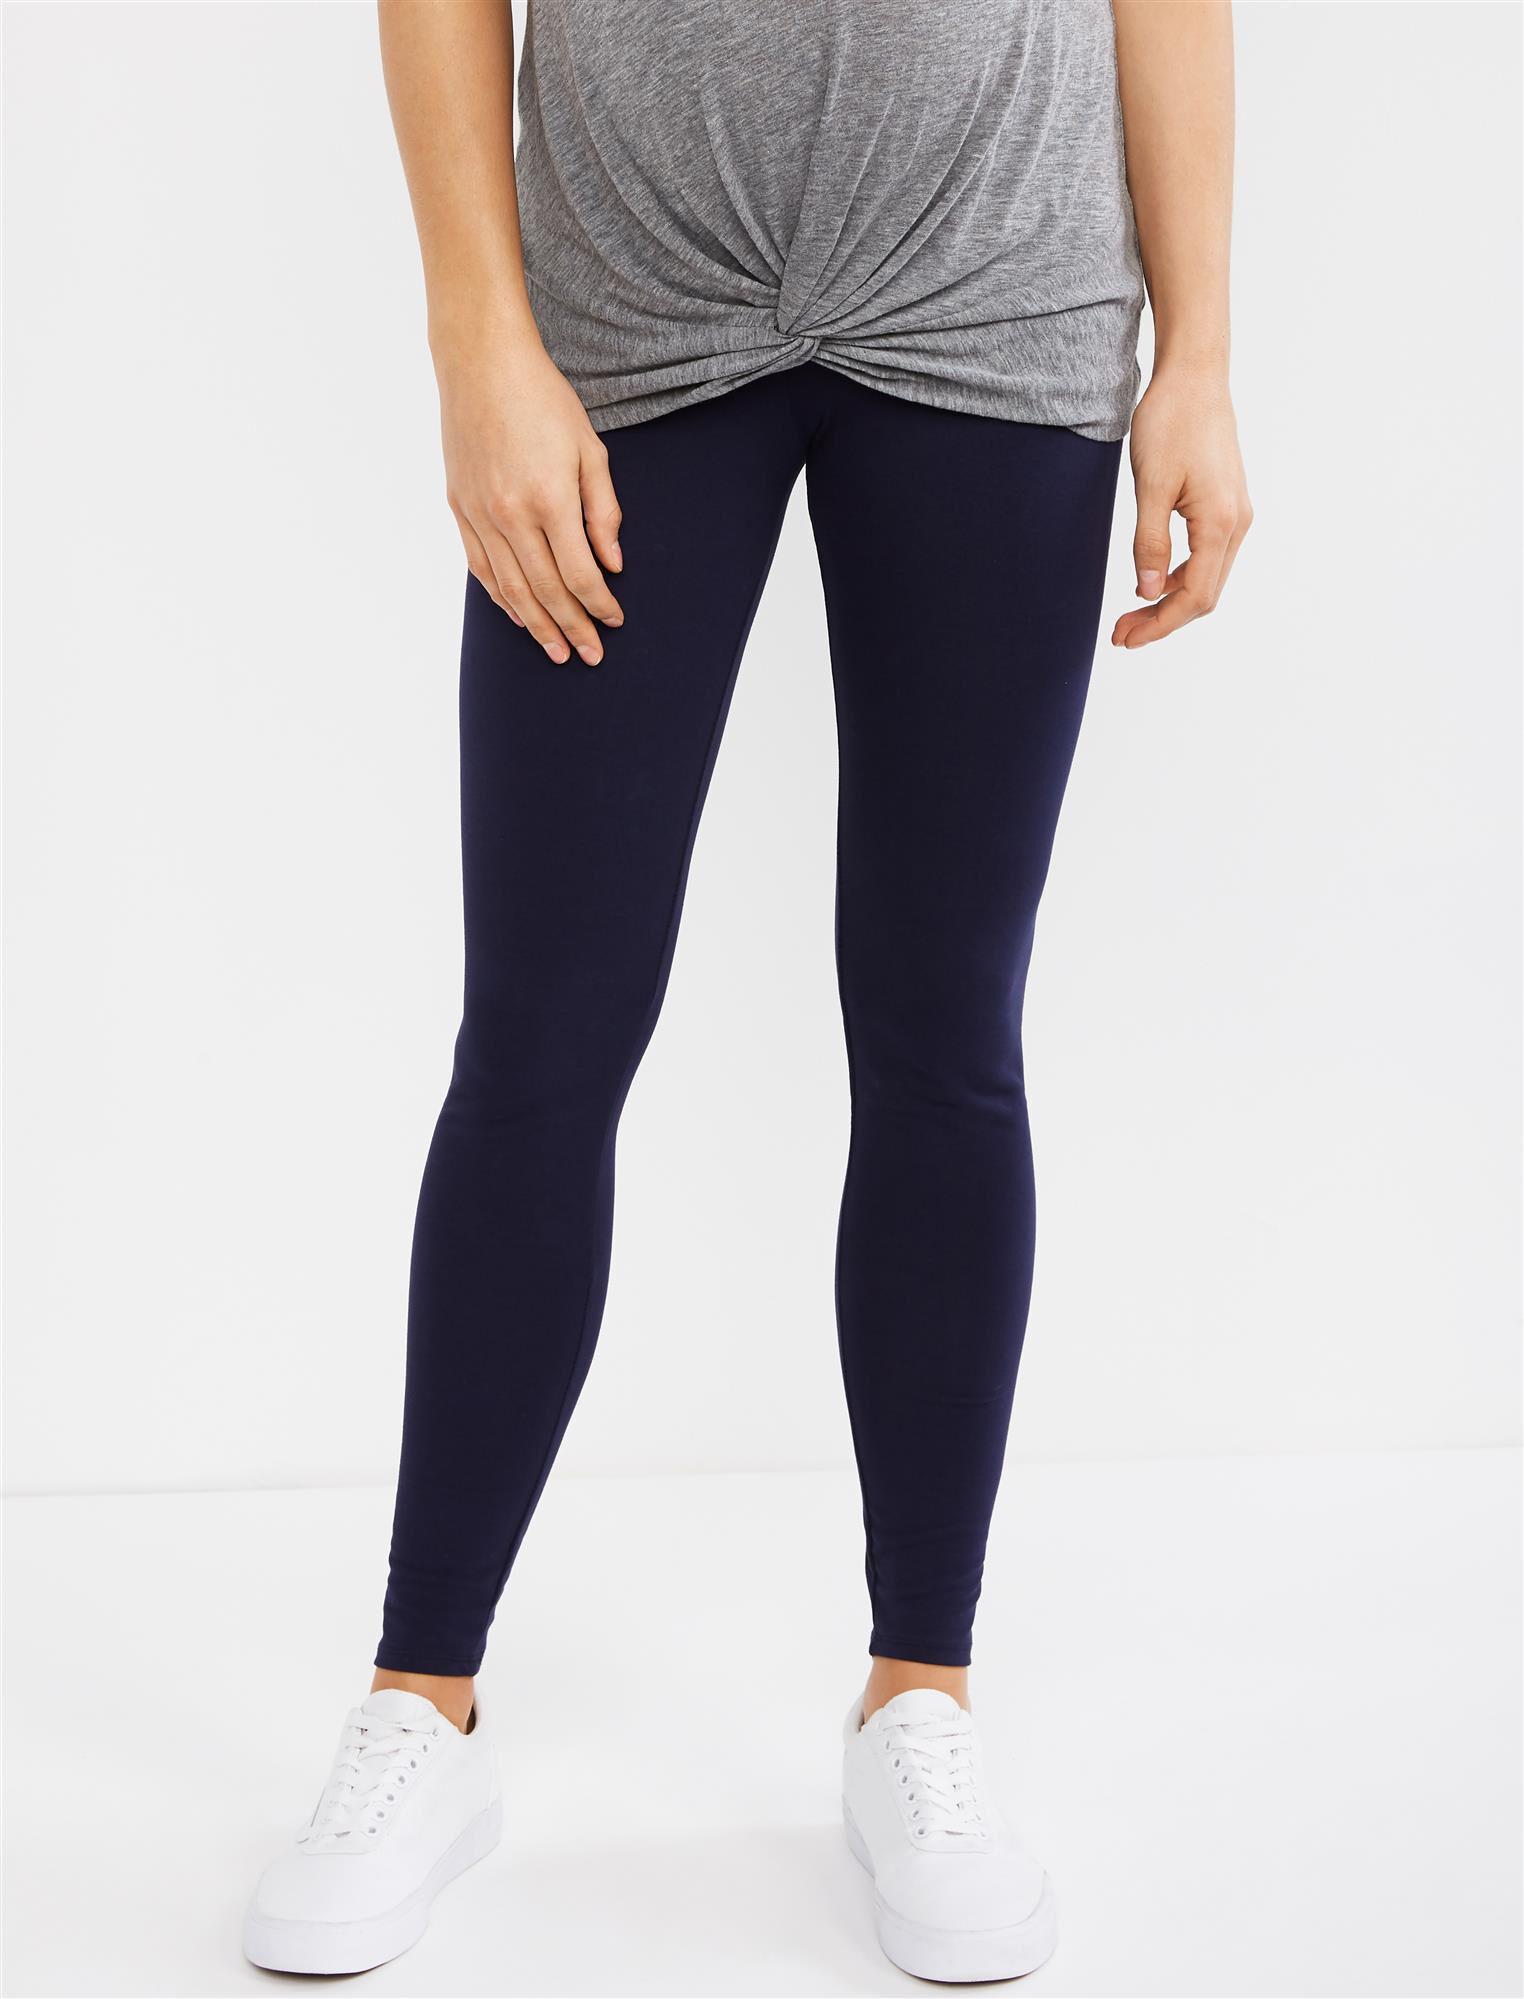 Secret Fit Belly Maternity Leggings- Solid